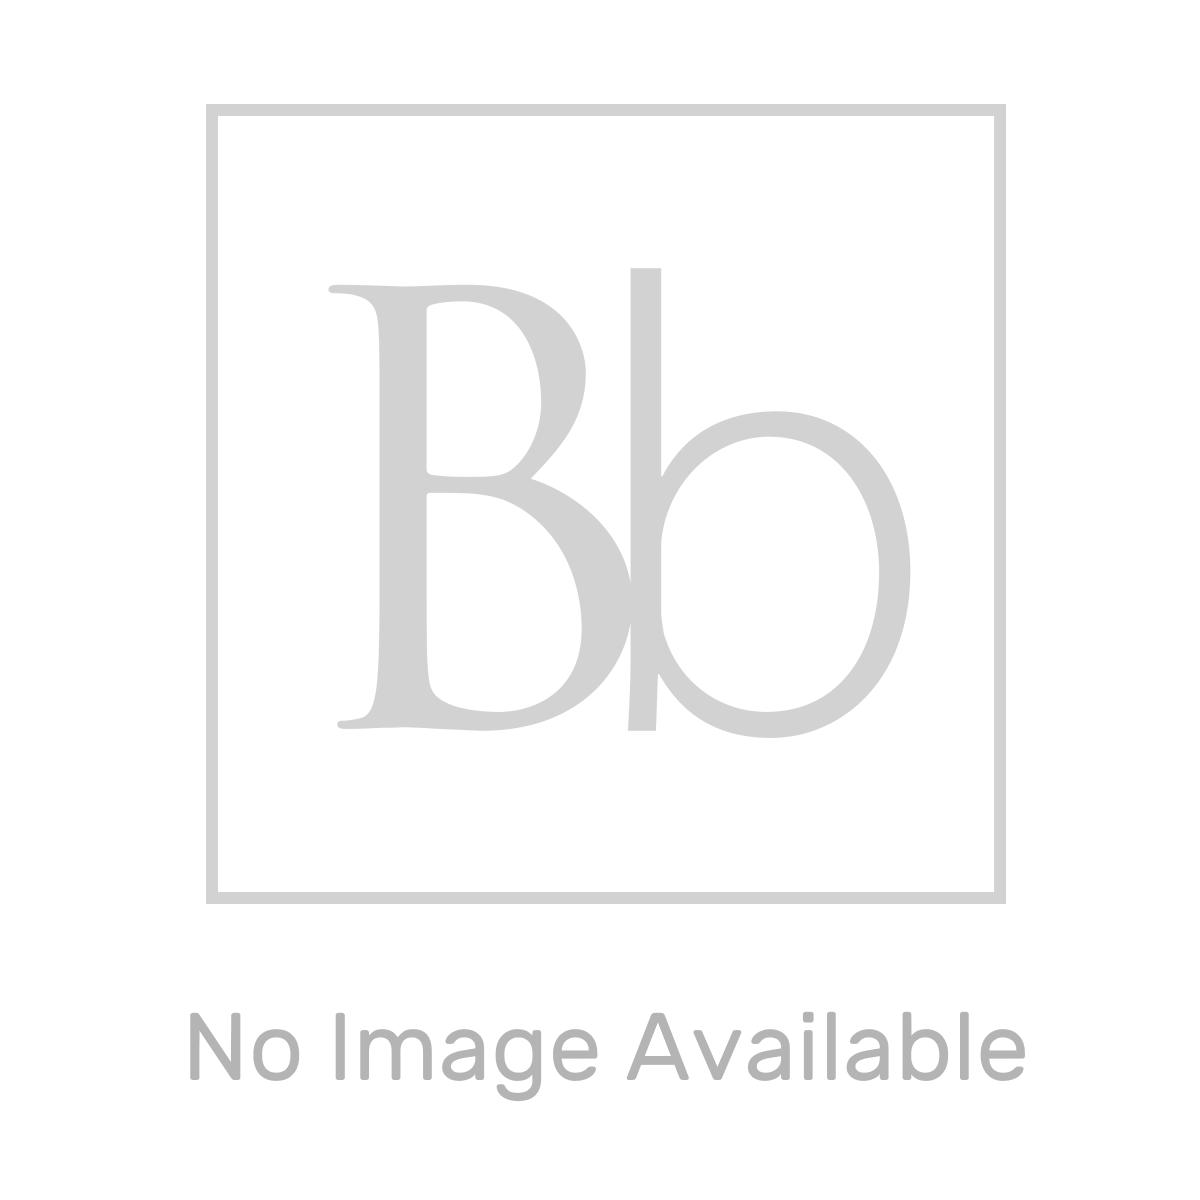 Tavistock Varsity Thermostatic Exposed Dual Function Shower System - Lifestyle